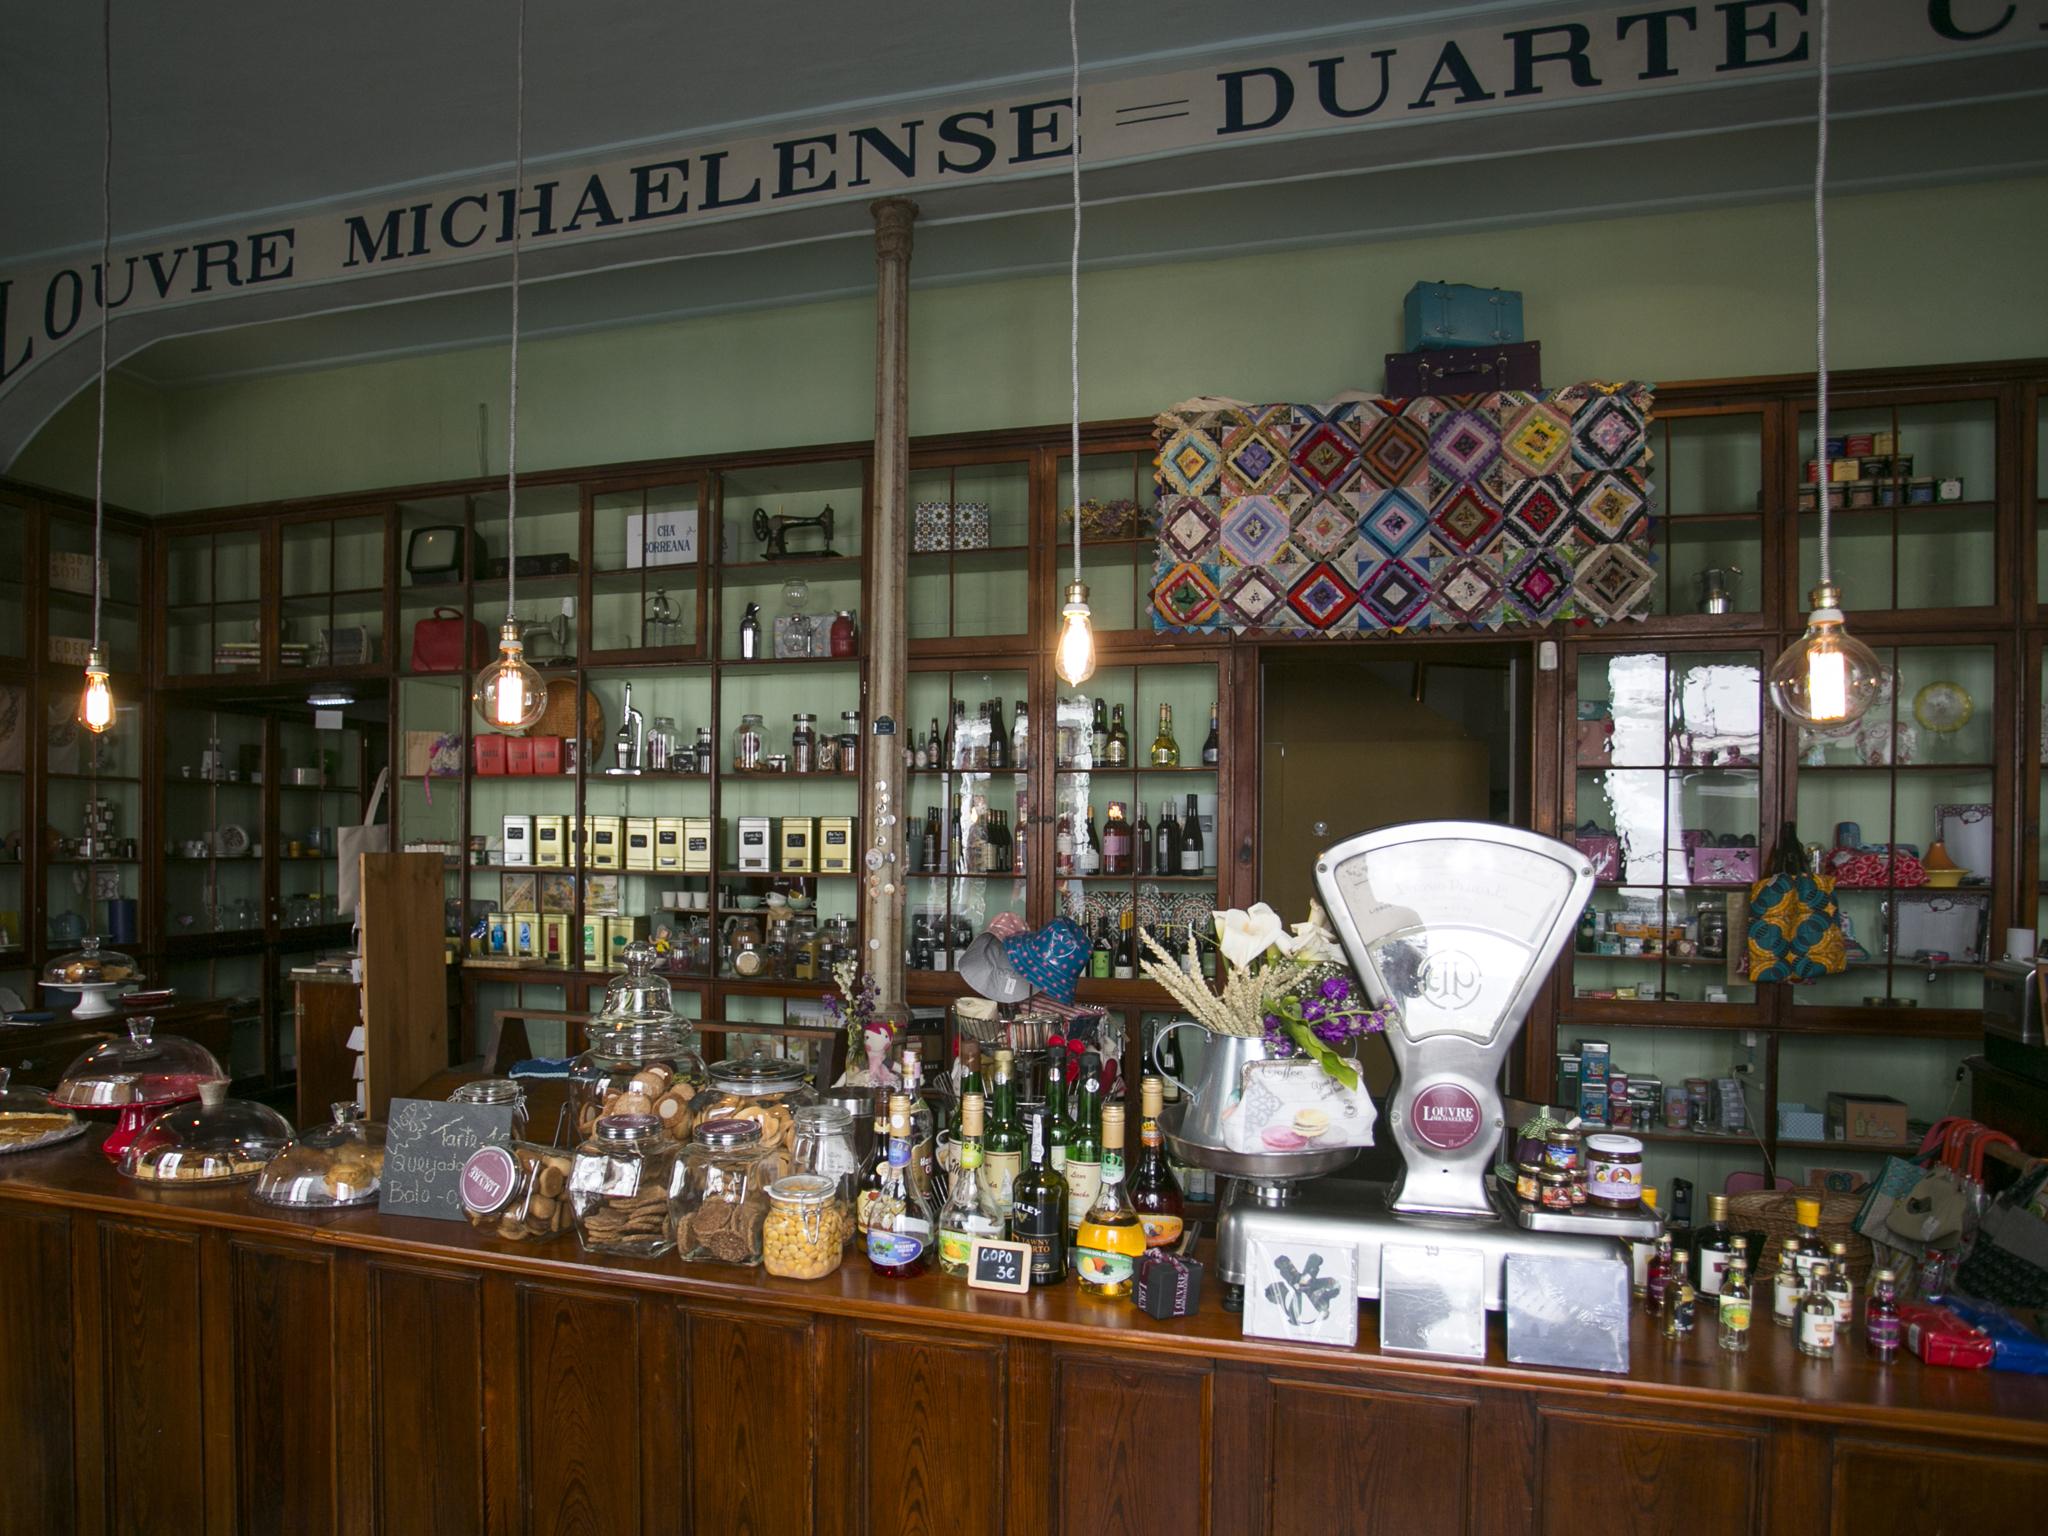 Louvre michaelense